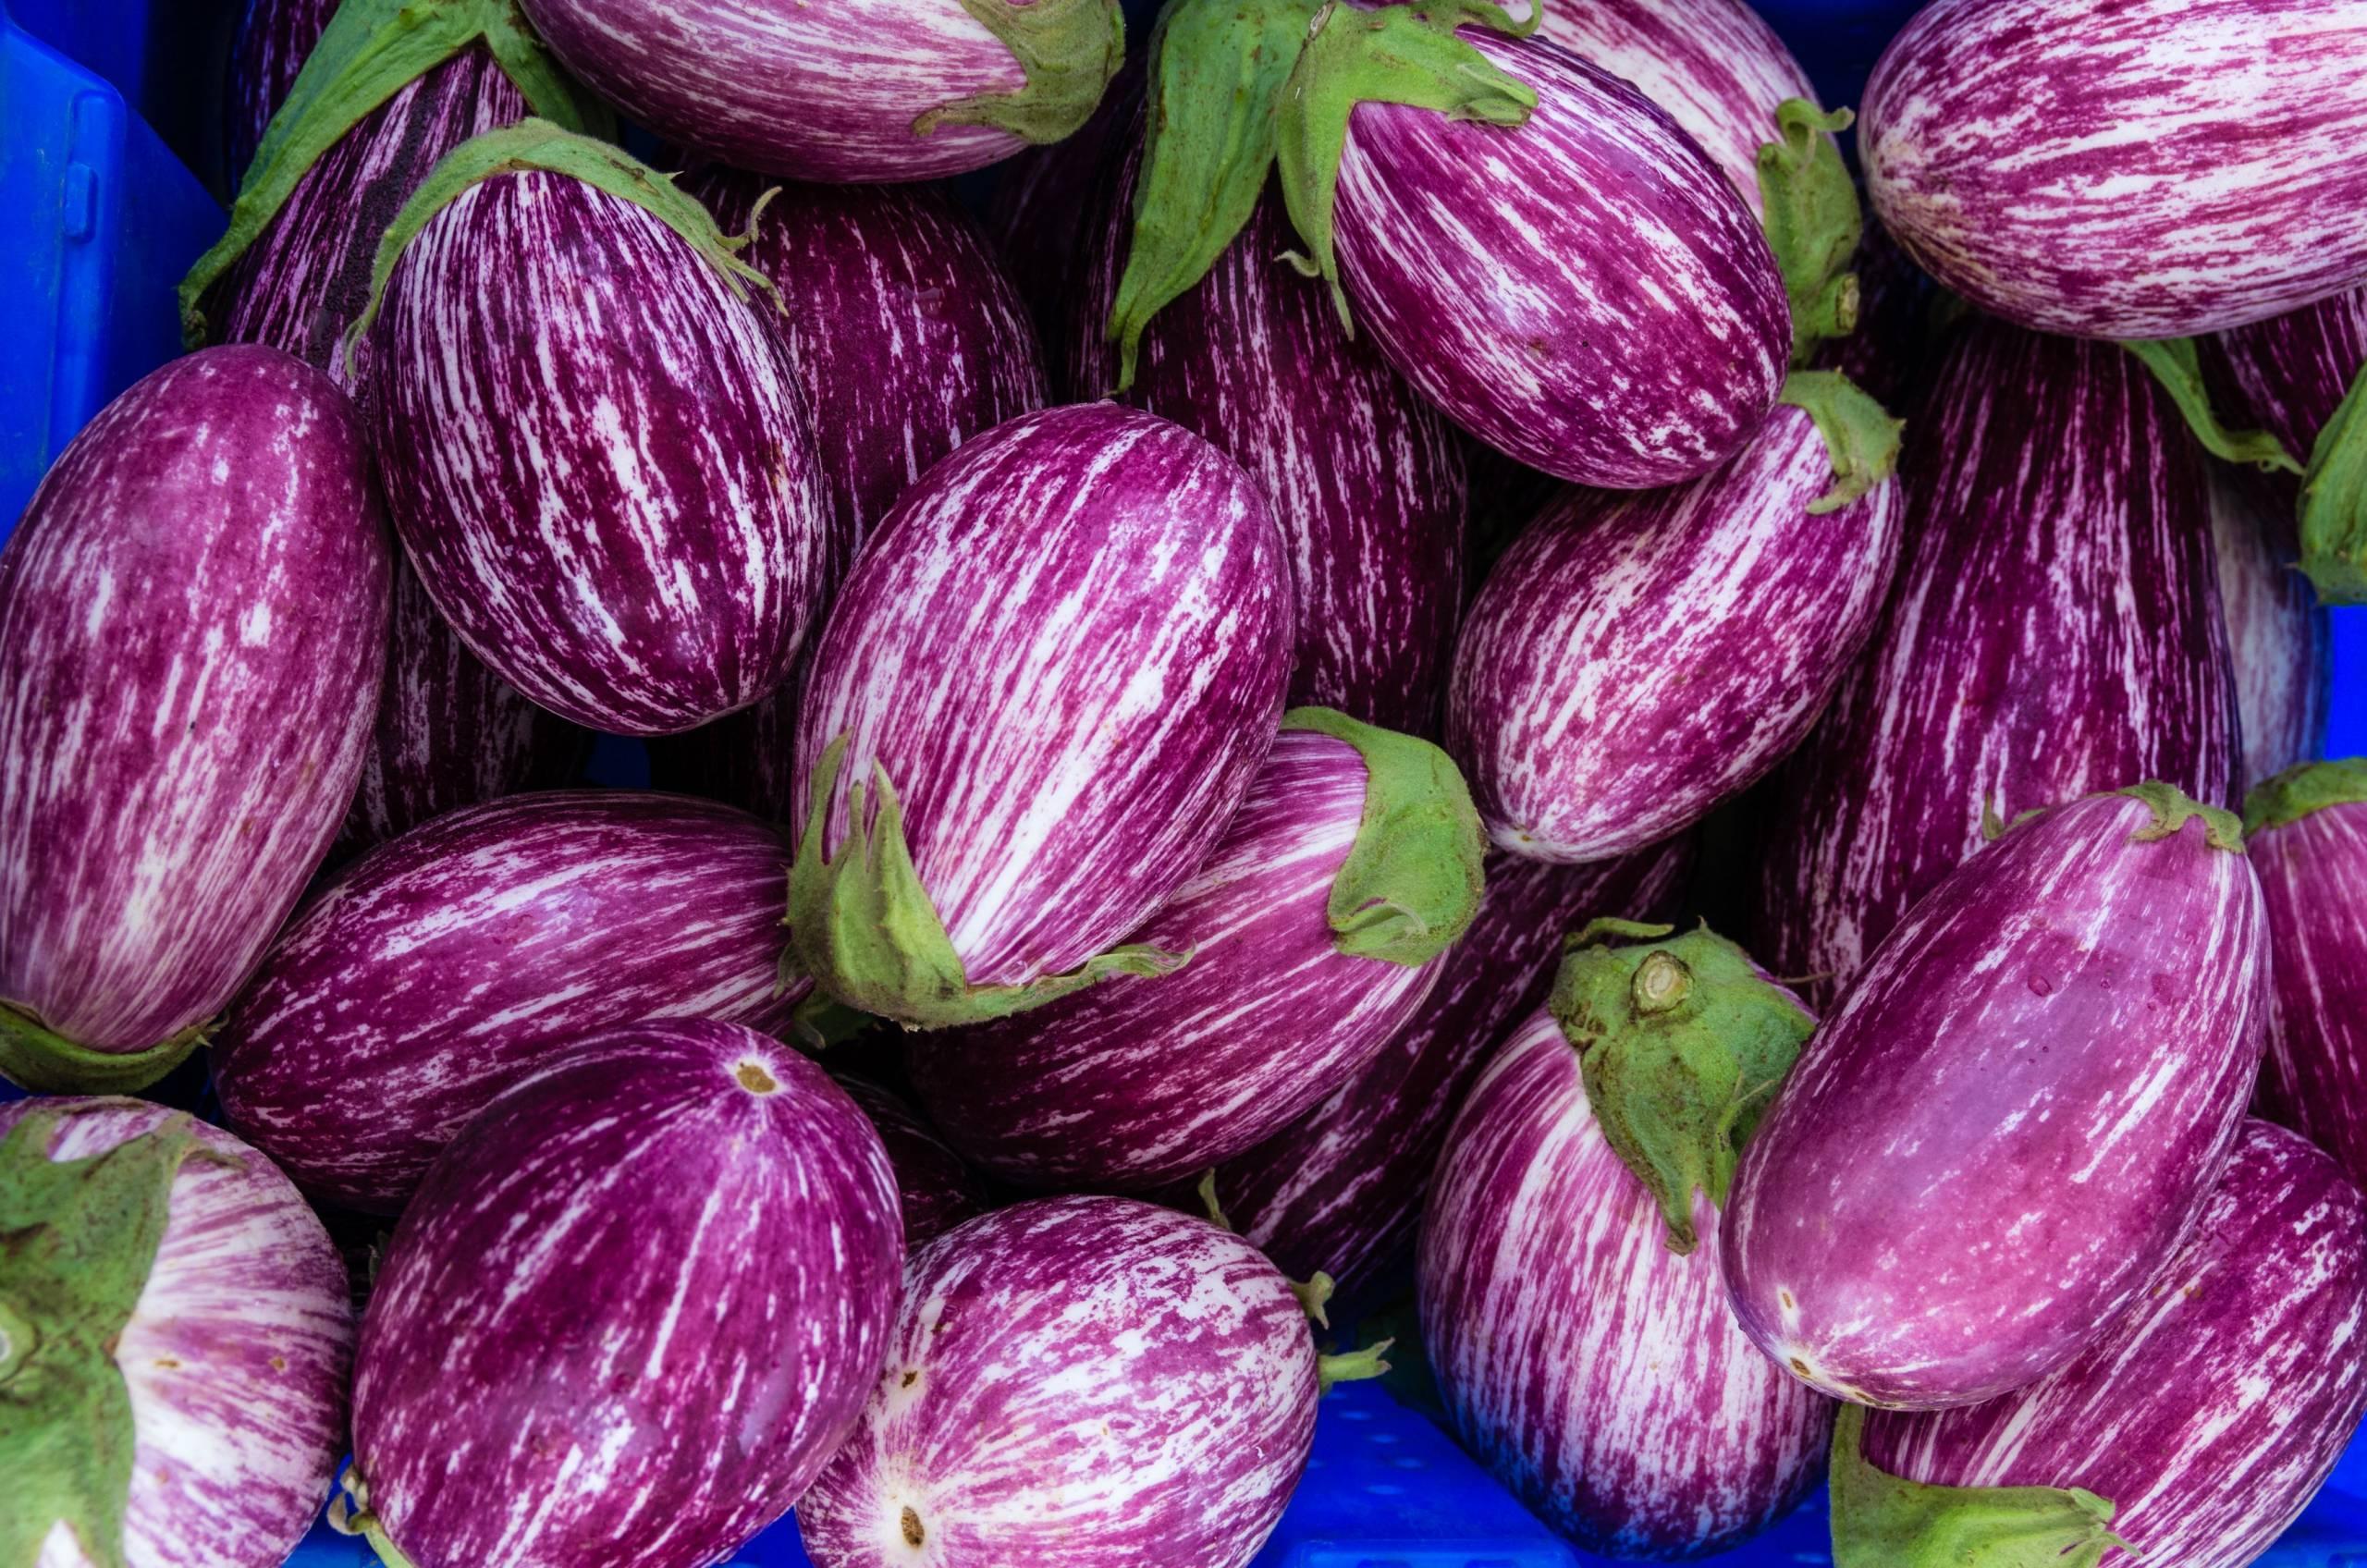 Chez Jean Martin, l'aubergine passe du champ à l'assiette